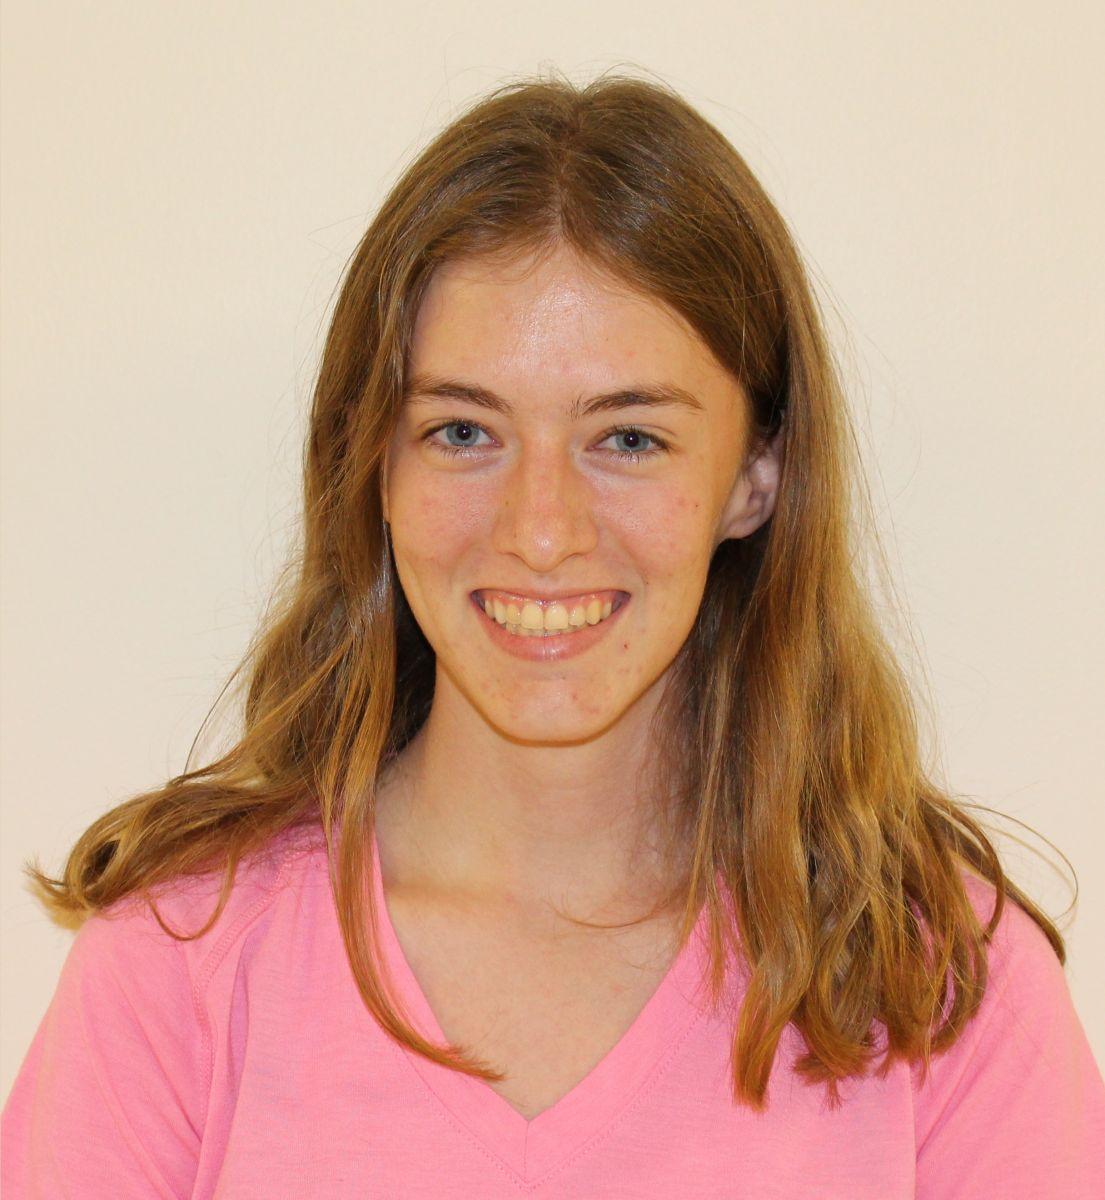 Laura Neilsen